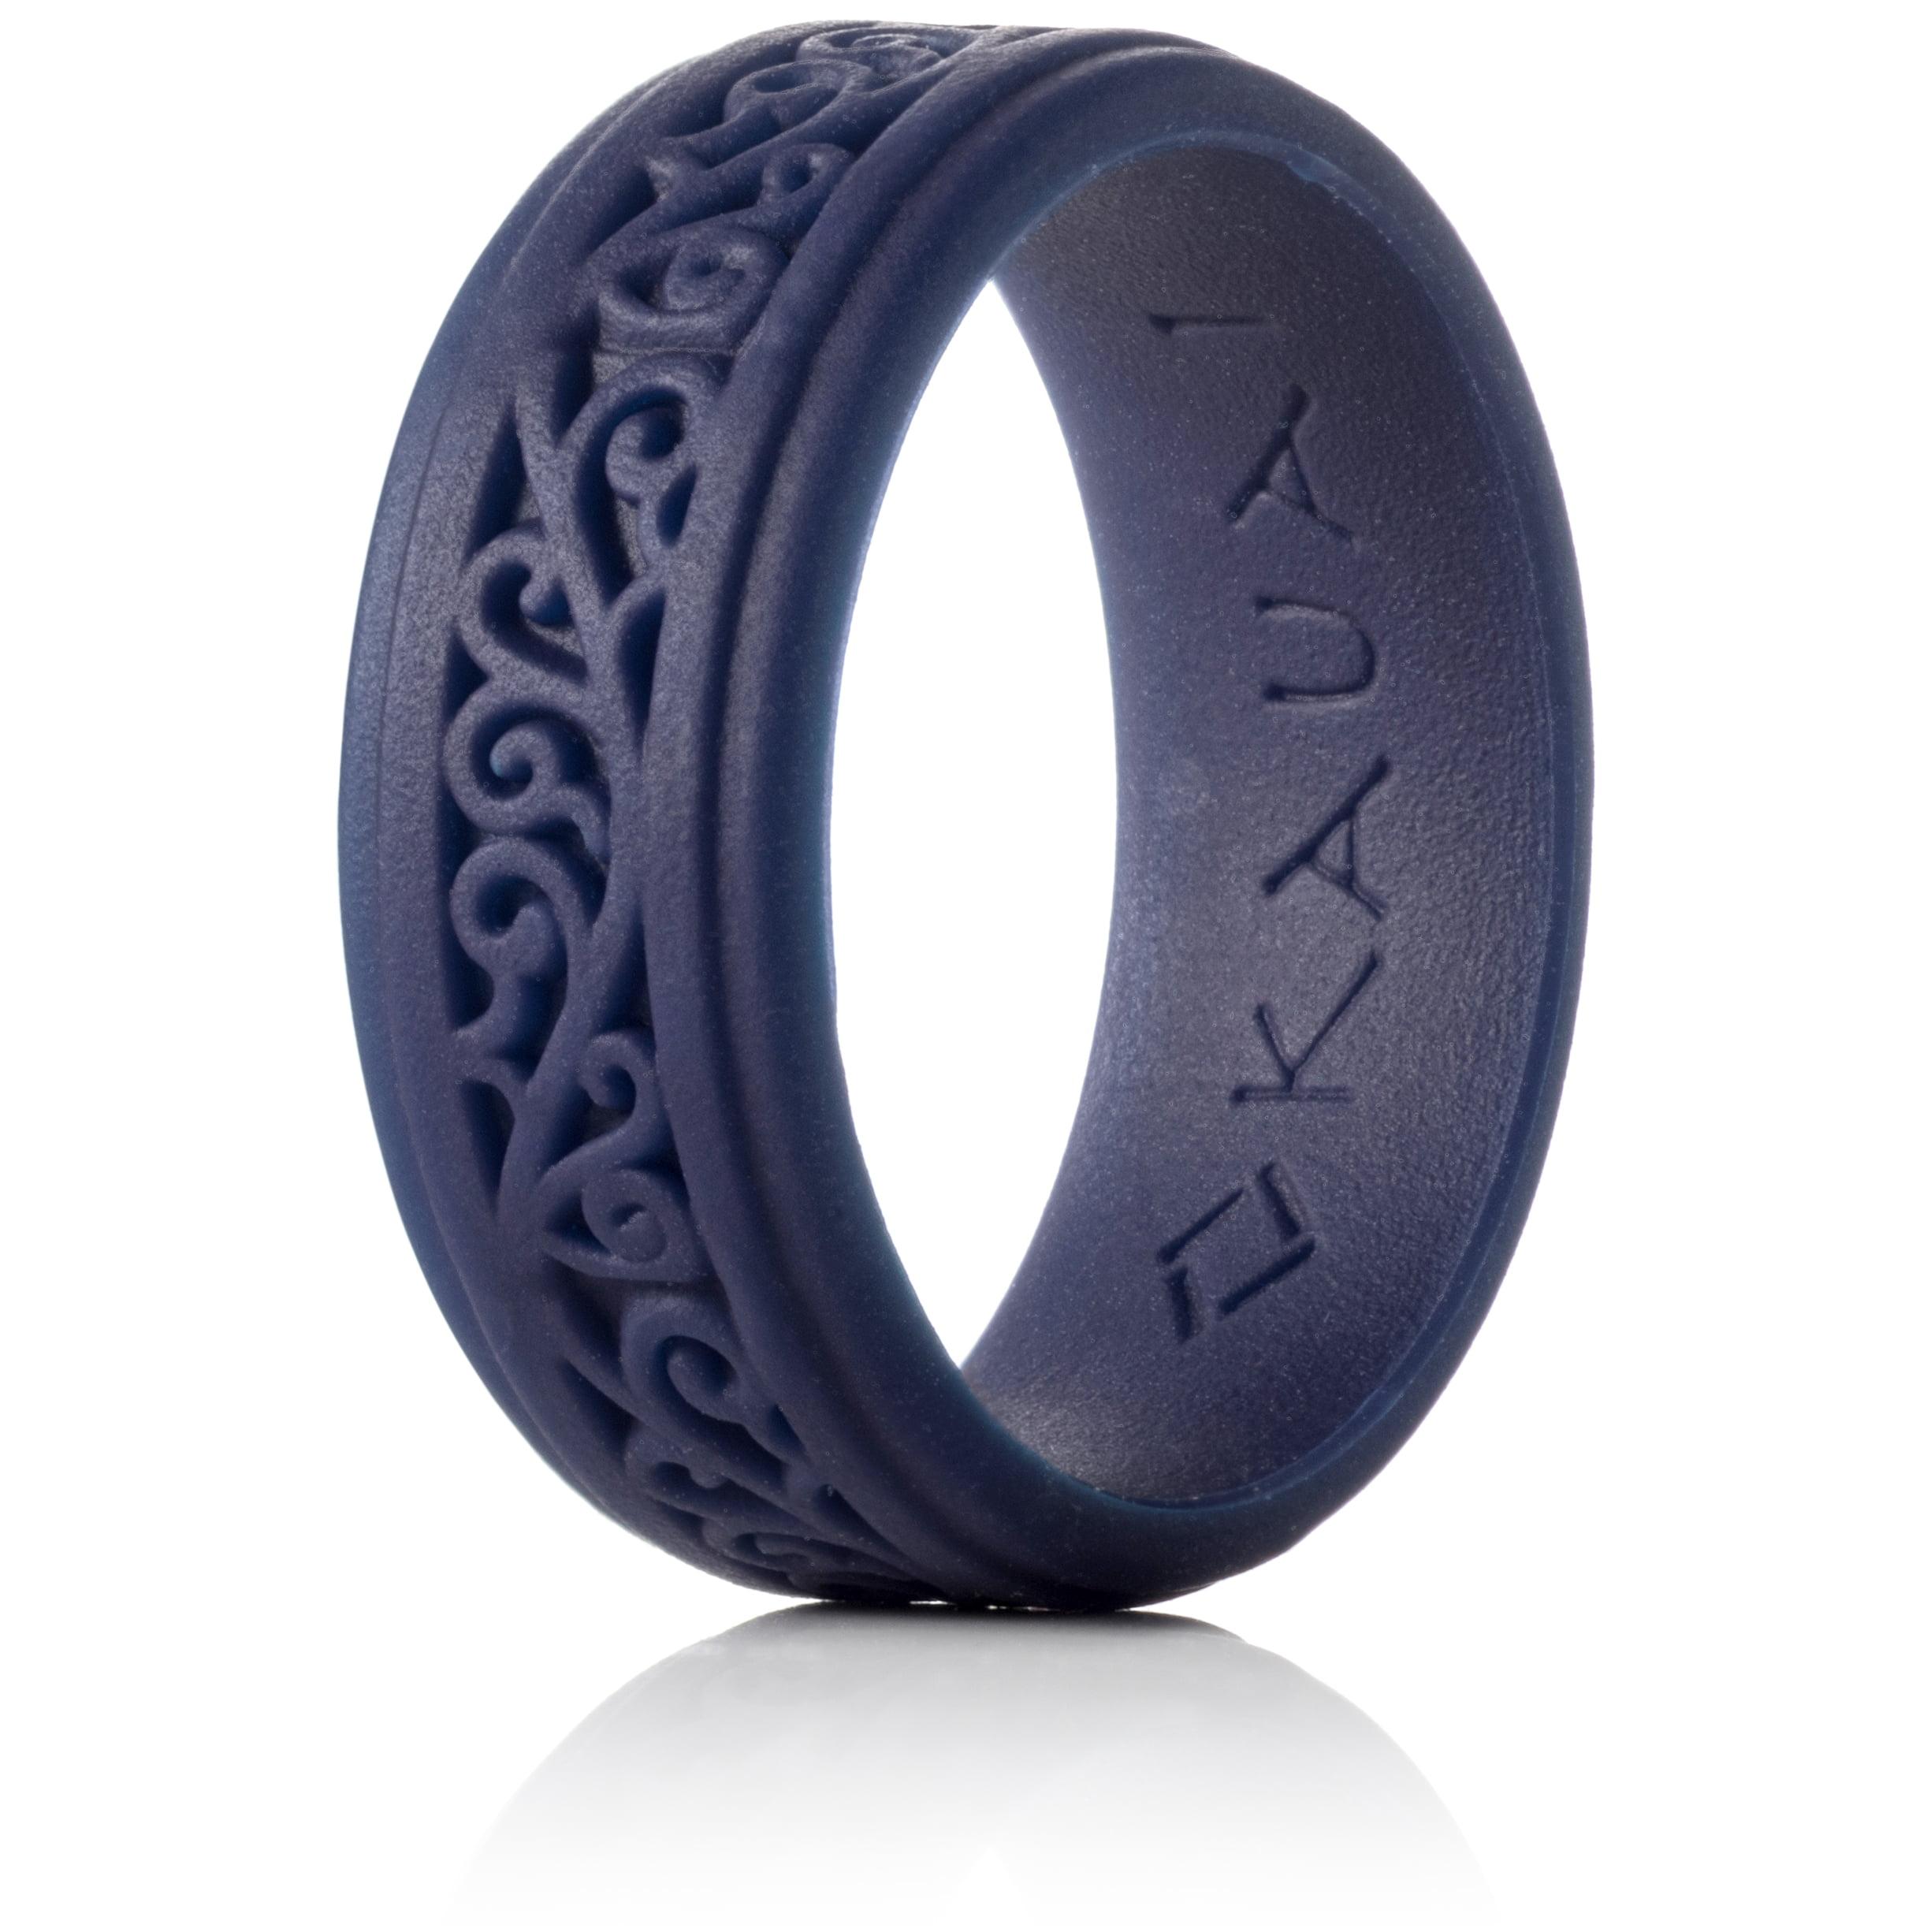 KAUAI -Silicone Rings Elegant, Comfortable, Engagement